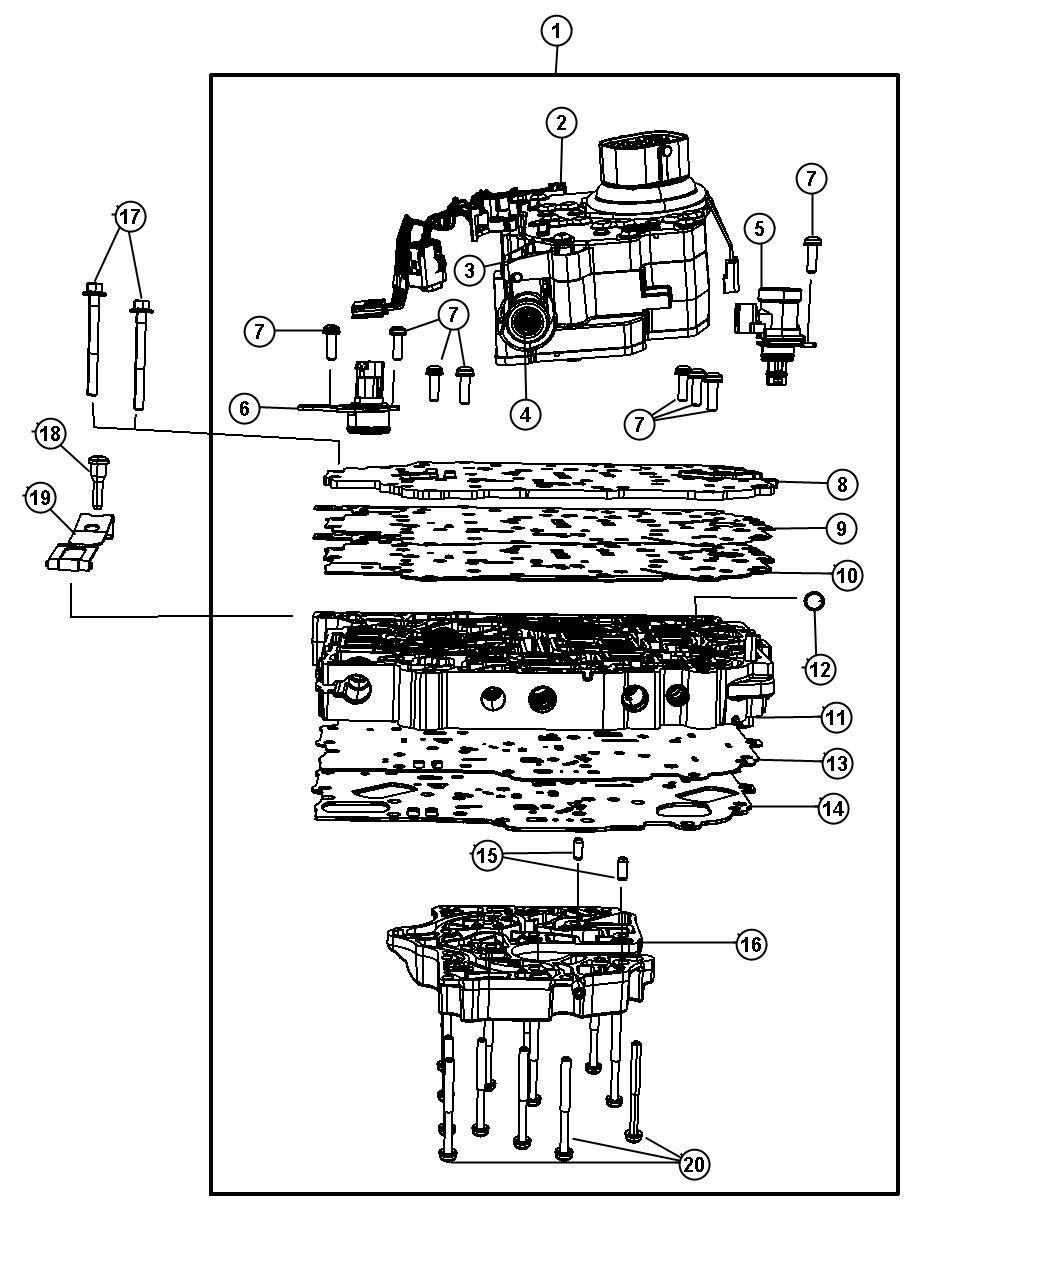 2007 chrysler aspen fuse diagram intermediate light switch wiring uk 2013 bmw x3 parts imageresizertool com